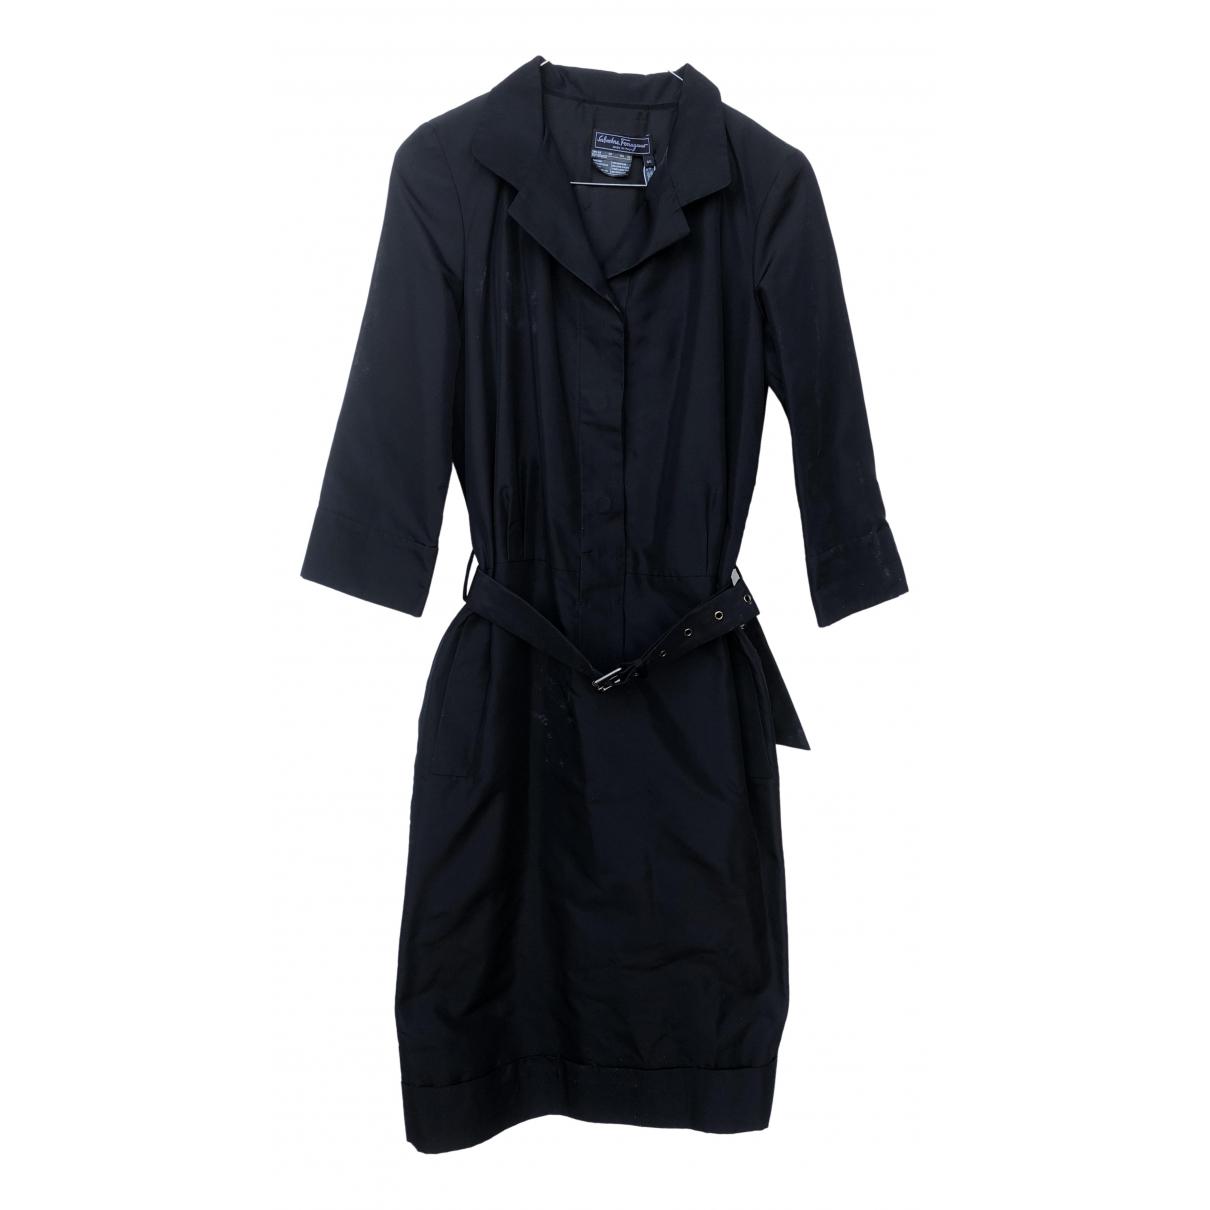 Salvatore Ferragamo \N Black dress for Women 40 IT